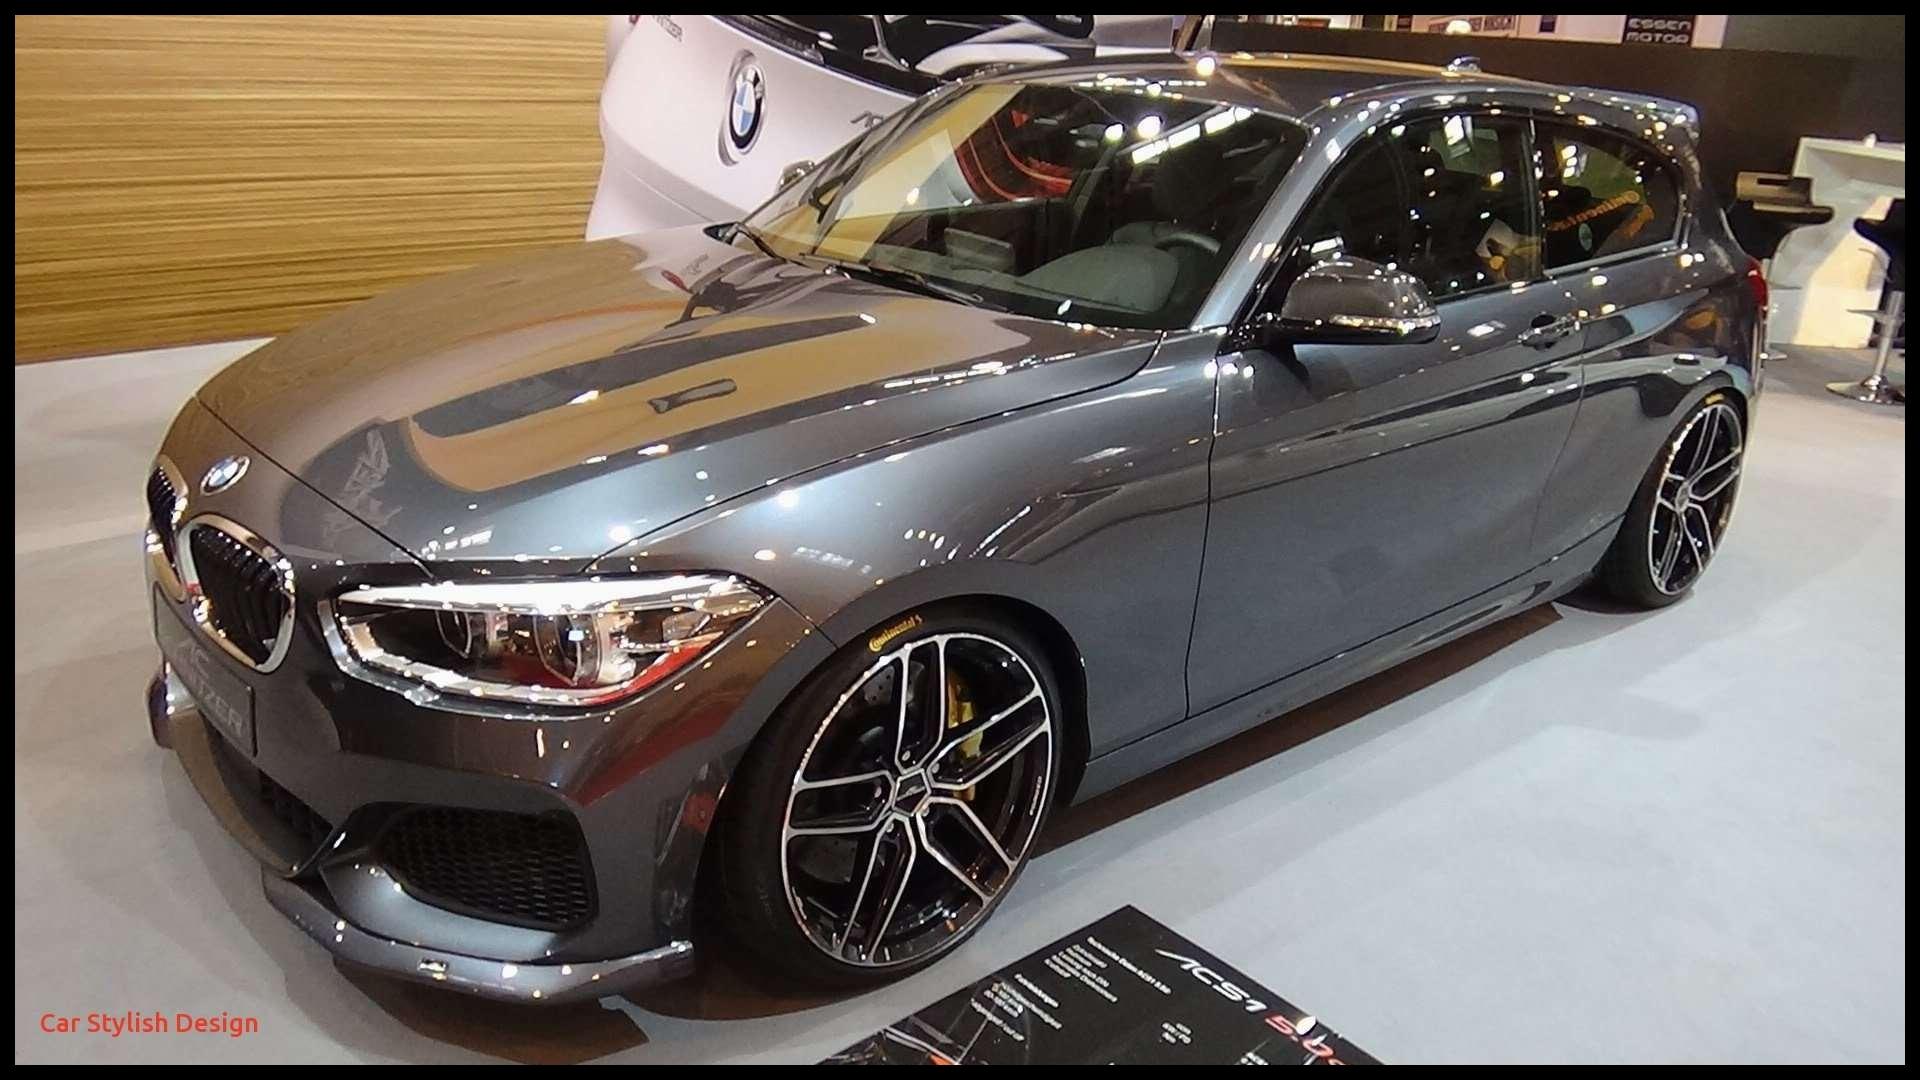 Bmw Kansas City Redesign and Price Bmw M3 Inspirational 2016 Bmw Acs1 5 0d by Ac